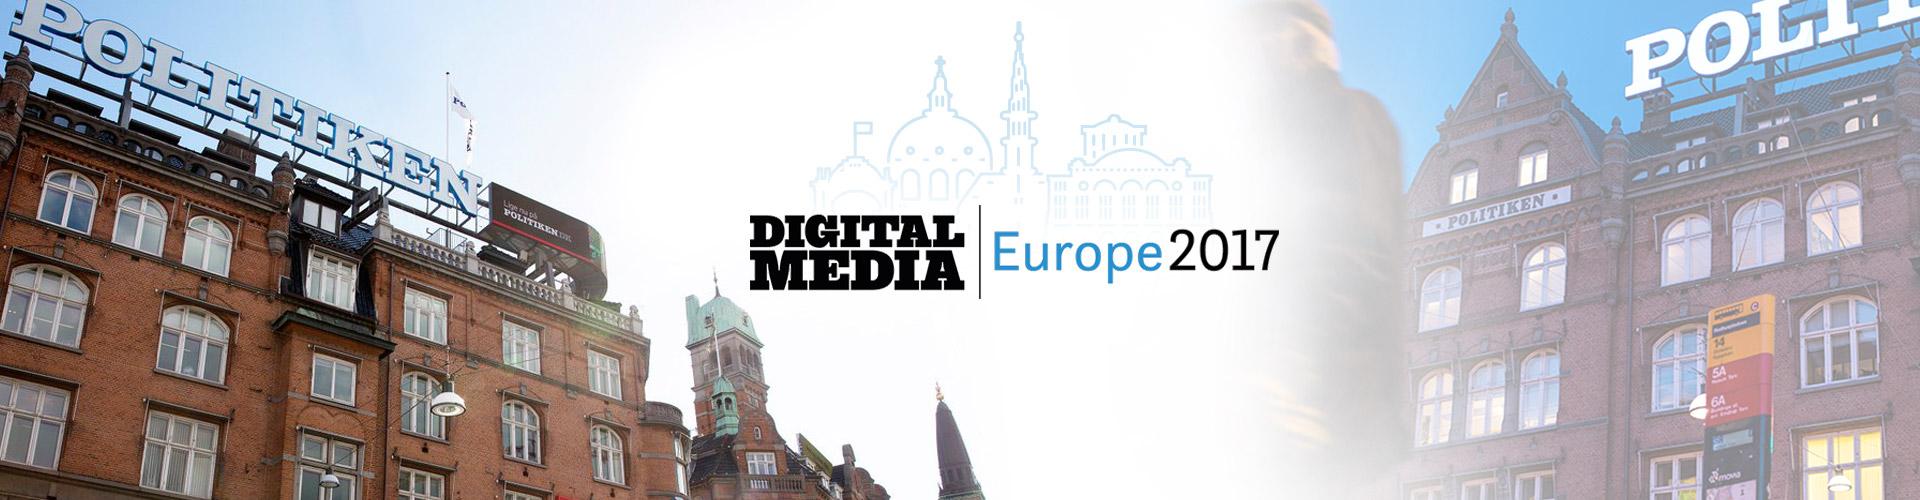 Digital Media Europe 2017 Round-up